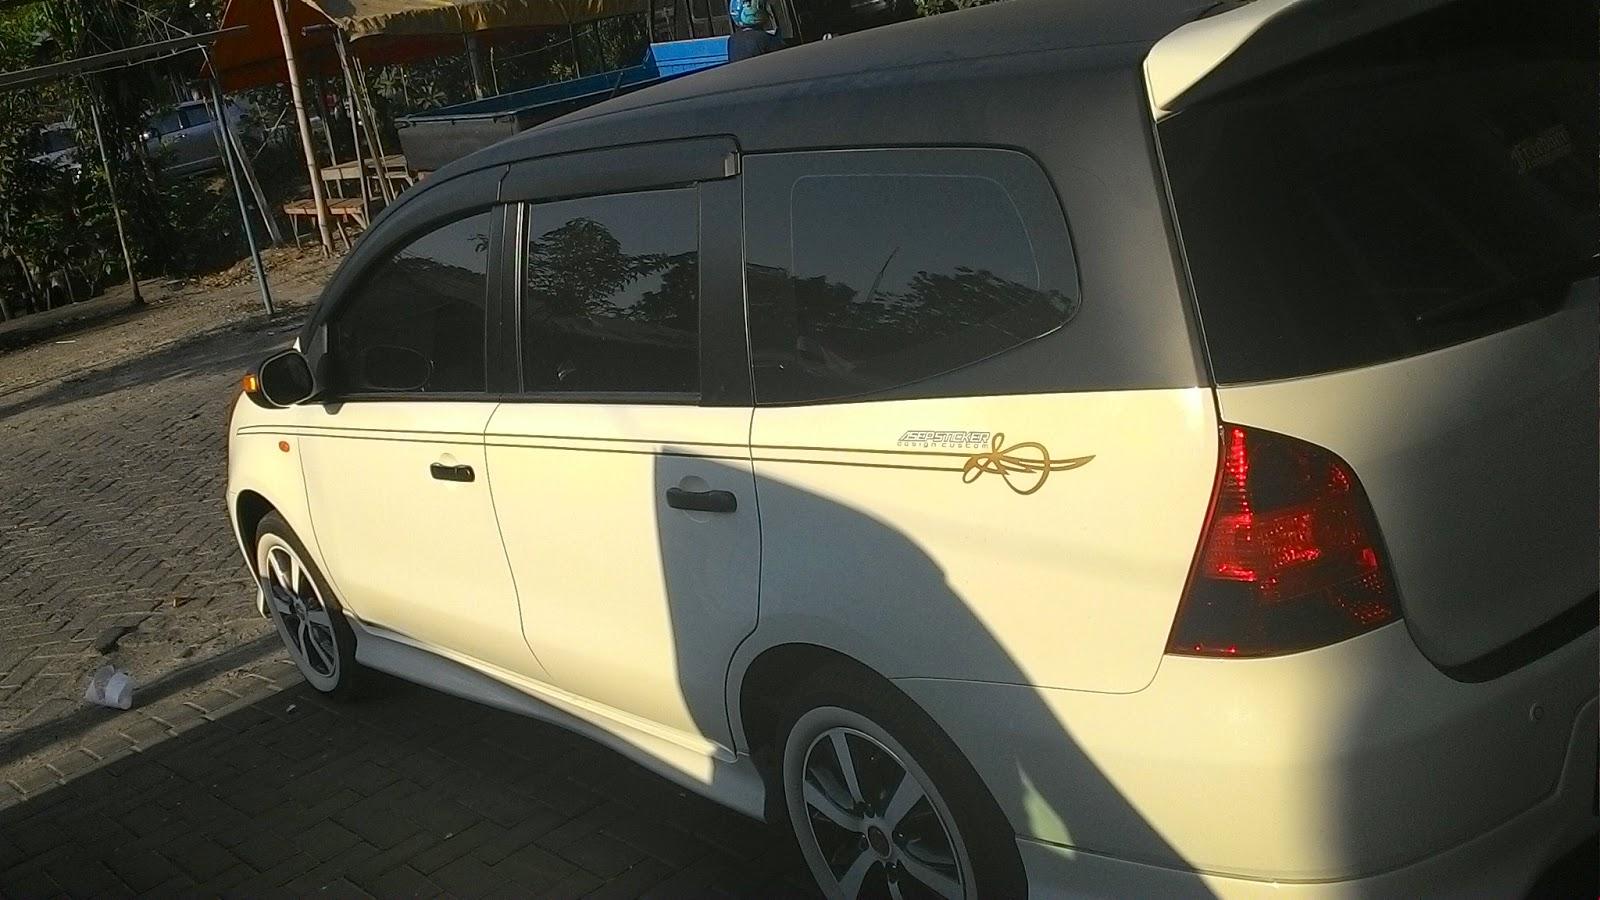 Kumpulan Cutting Sticker Mobil Livina Terlengkap Rekanotomotif